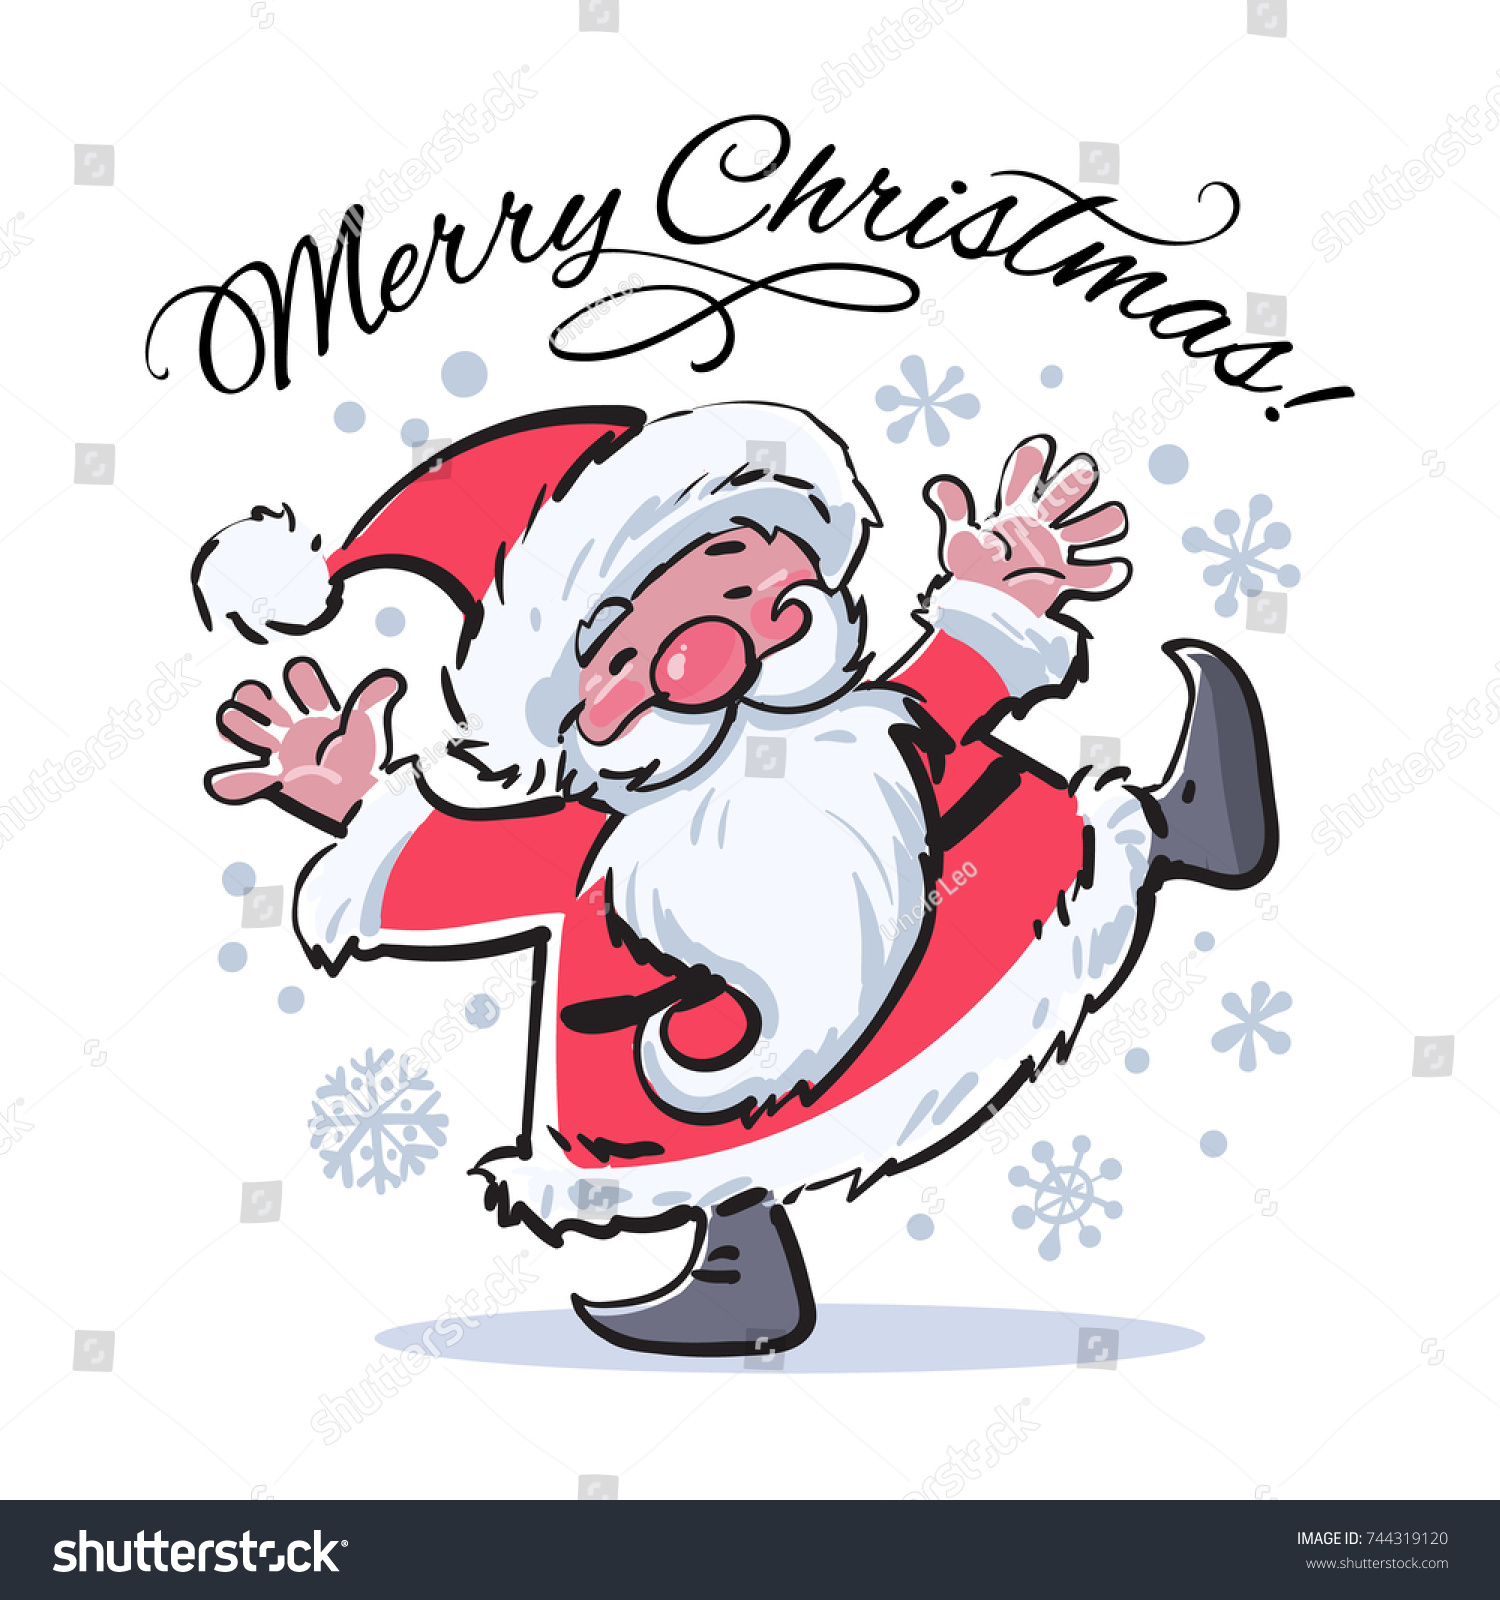 Funny Cartoon Santa Claus Merry Christmas Stock Vector (Royalty Free ...